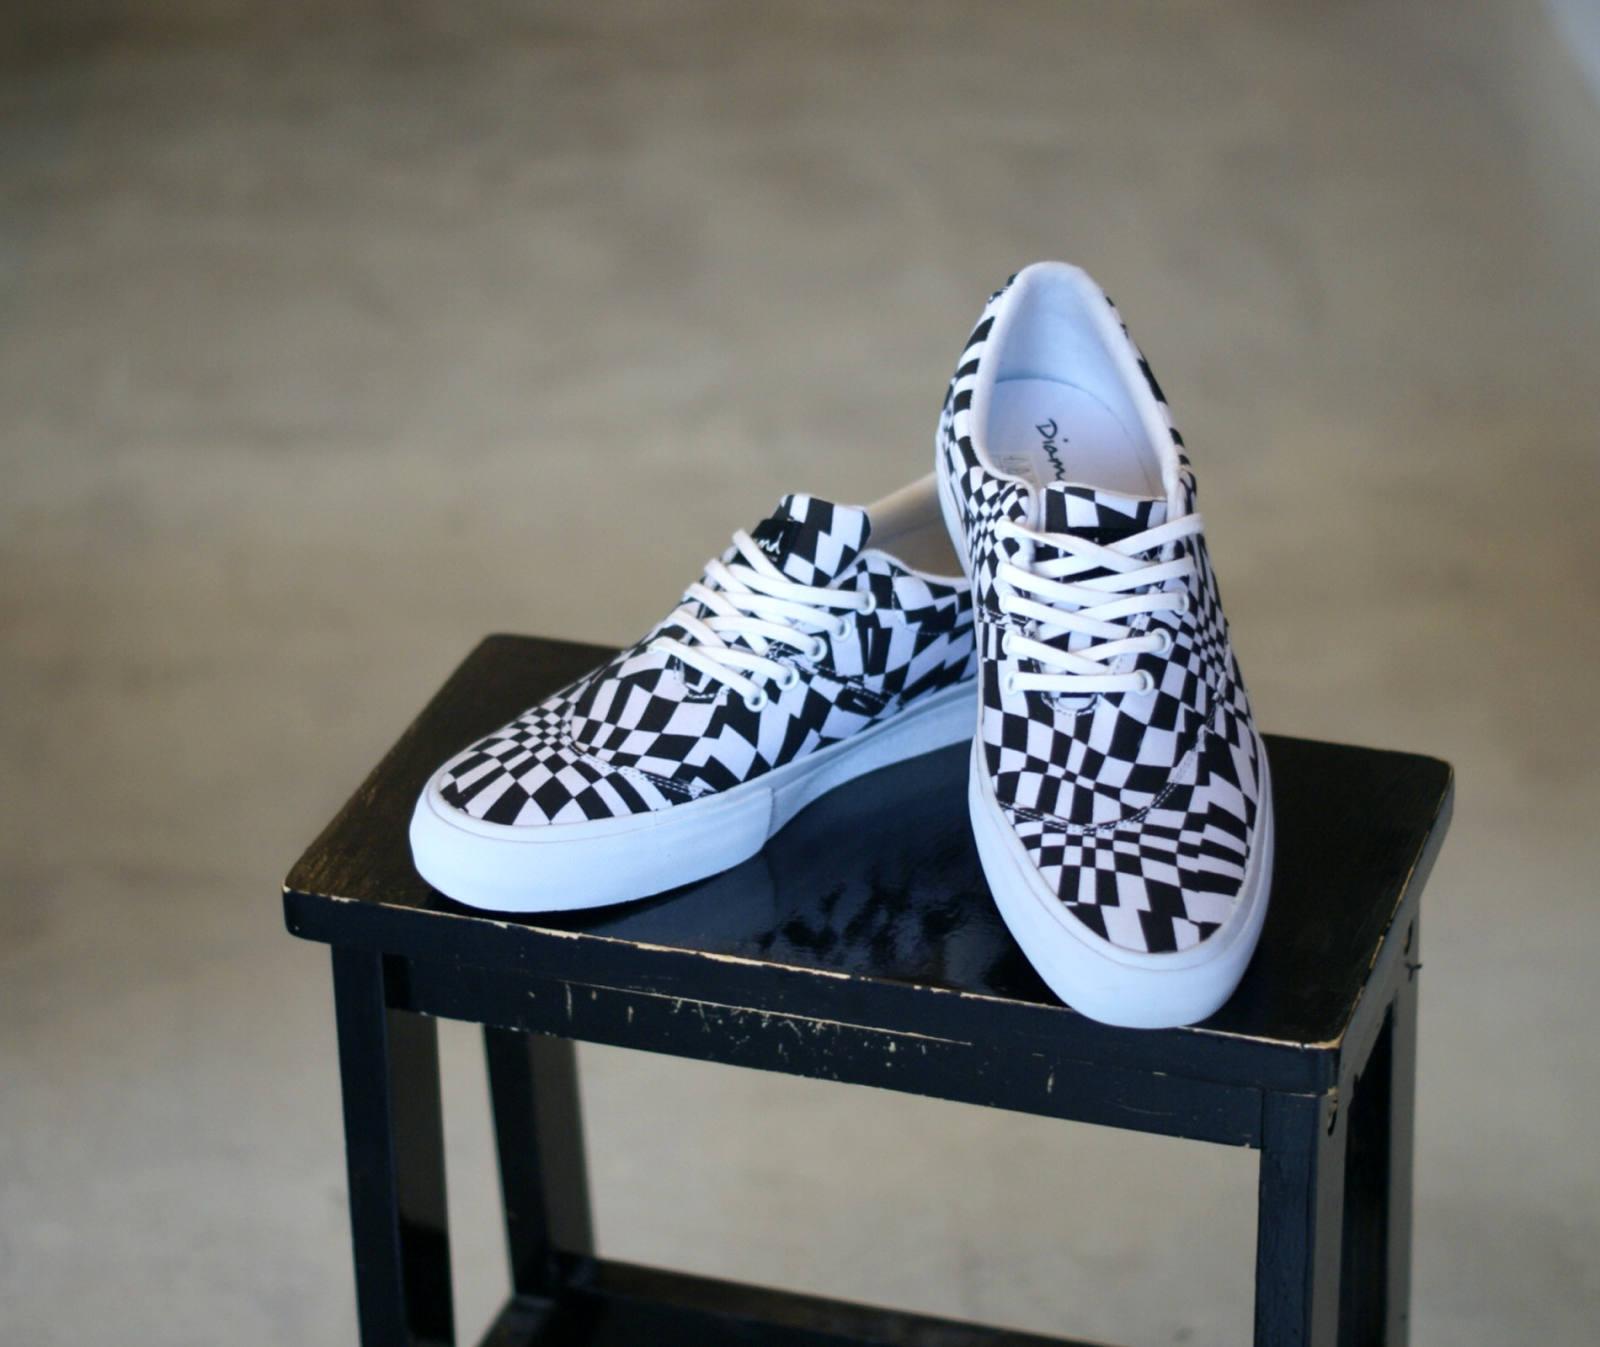 f4f1ba77e Diamond Supply Co. : Avenue QS Skate Shoes | FROG's TAIL